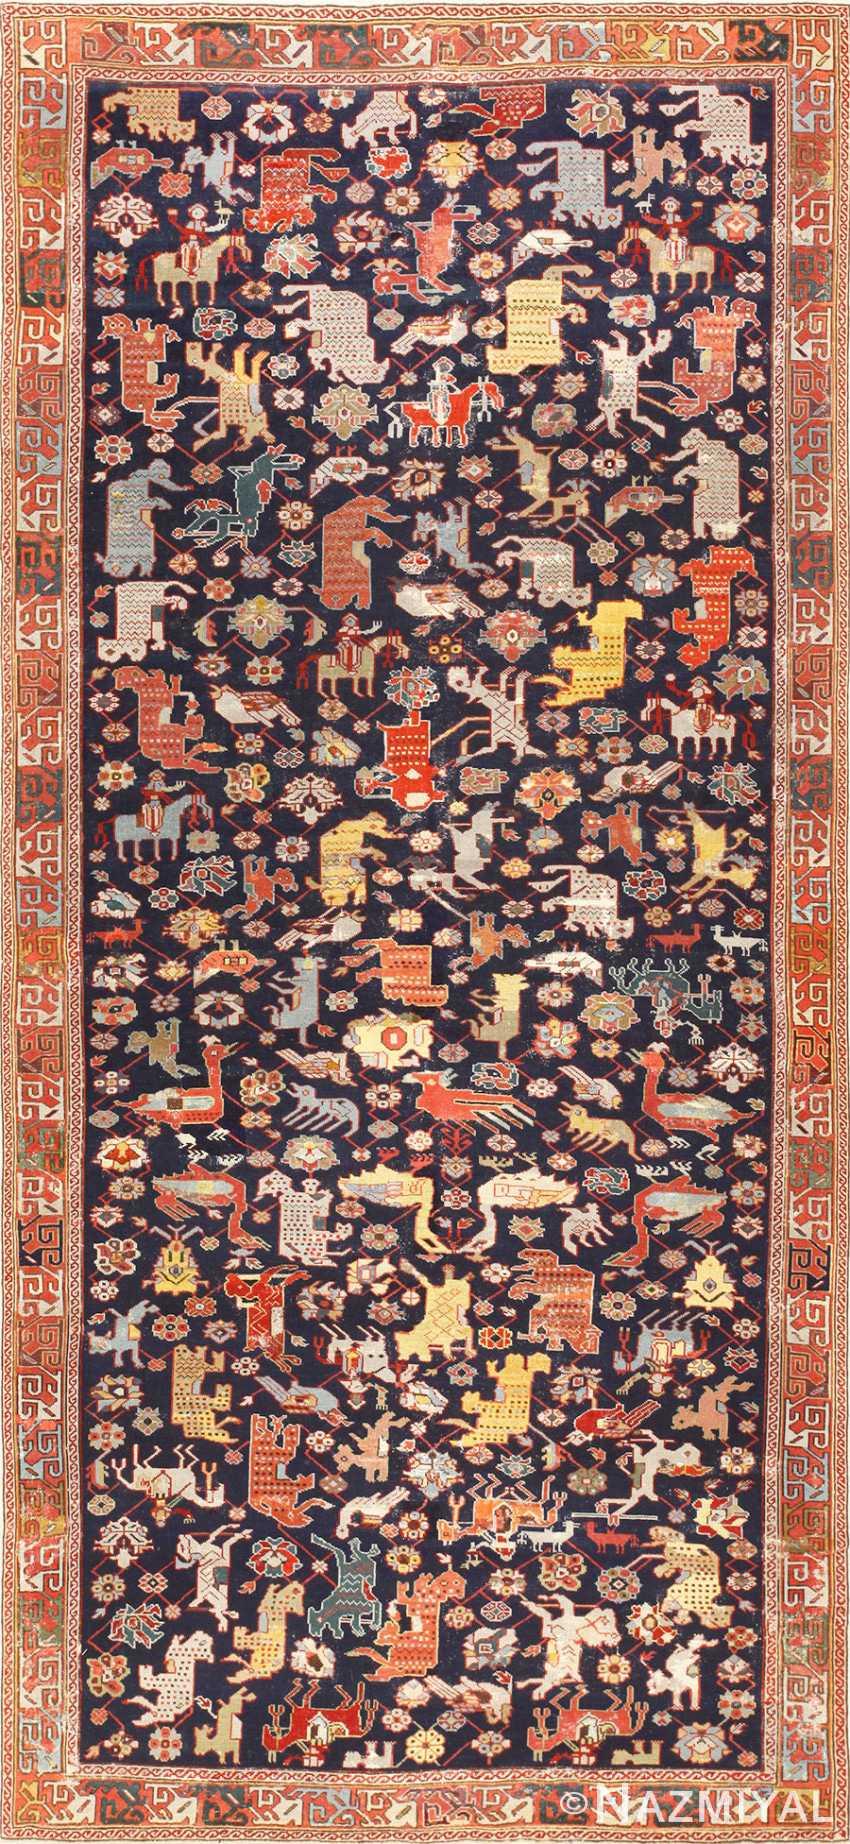 18th Century Caucasian Rug with Animal Design 48413 Nazmiyal